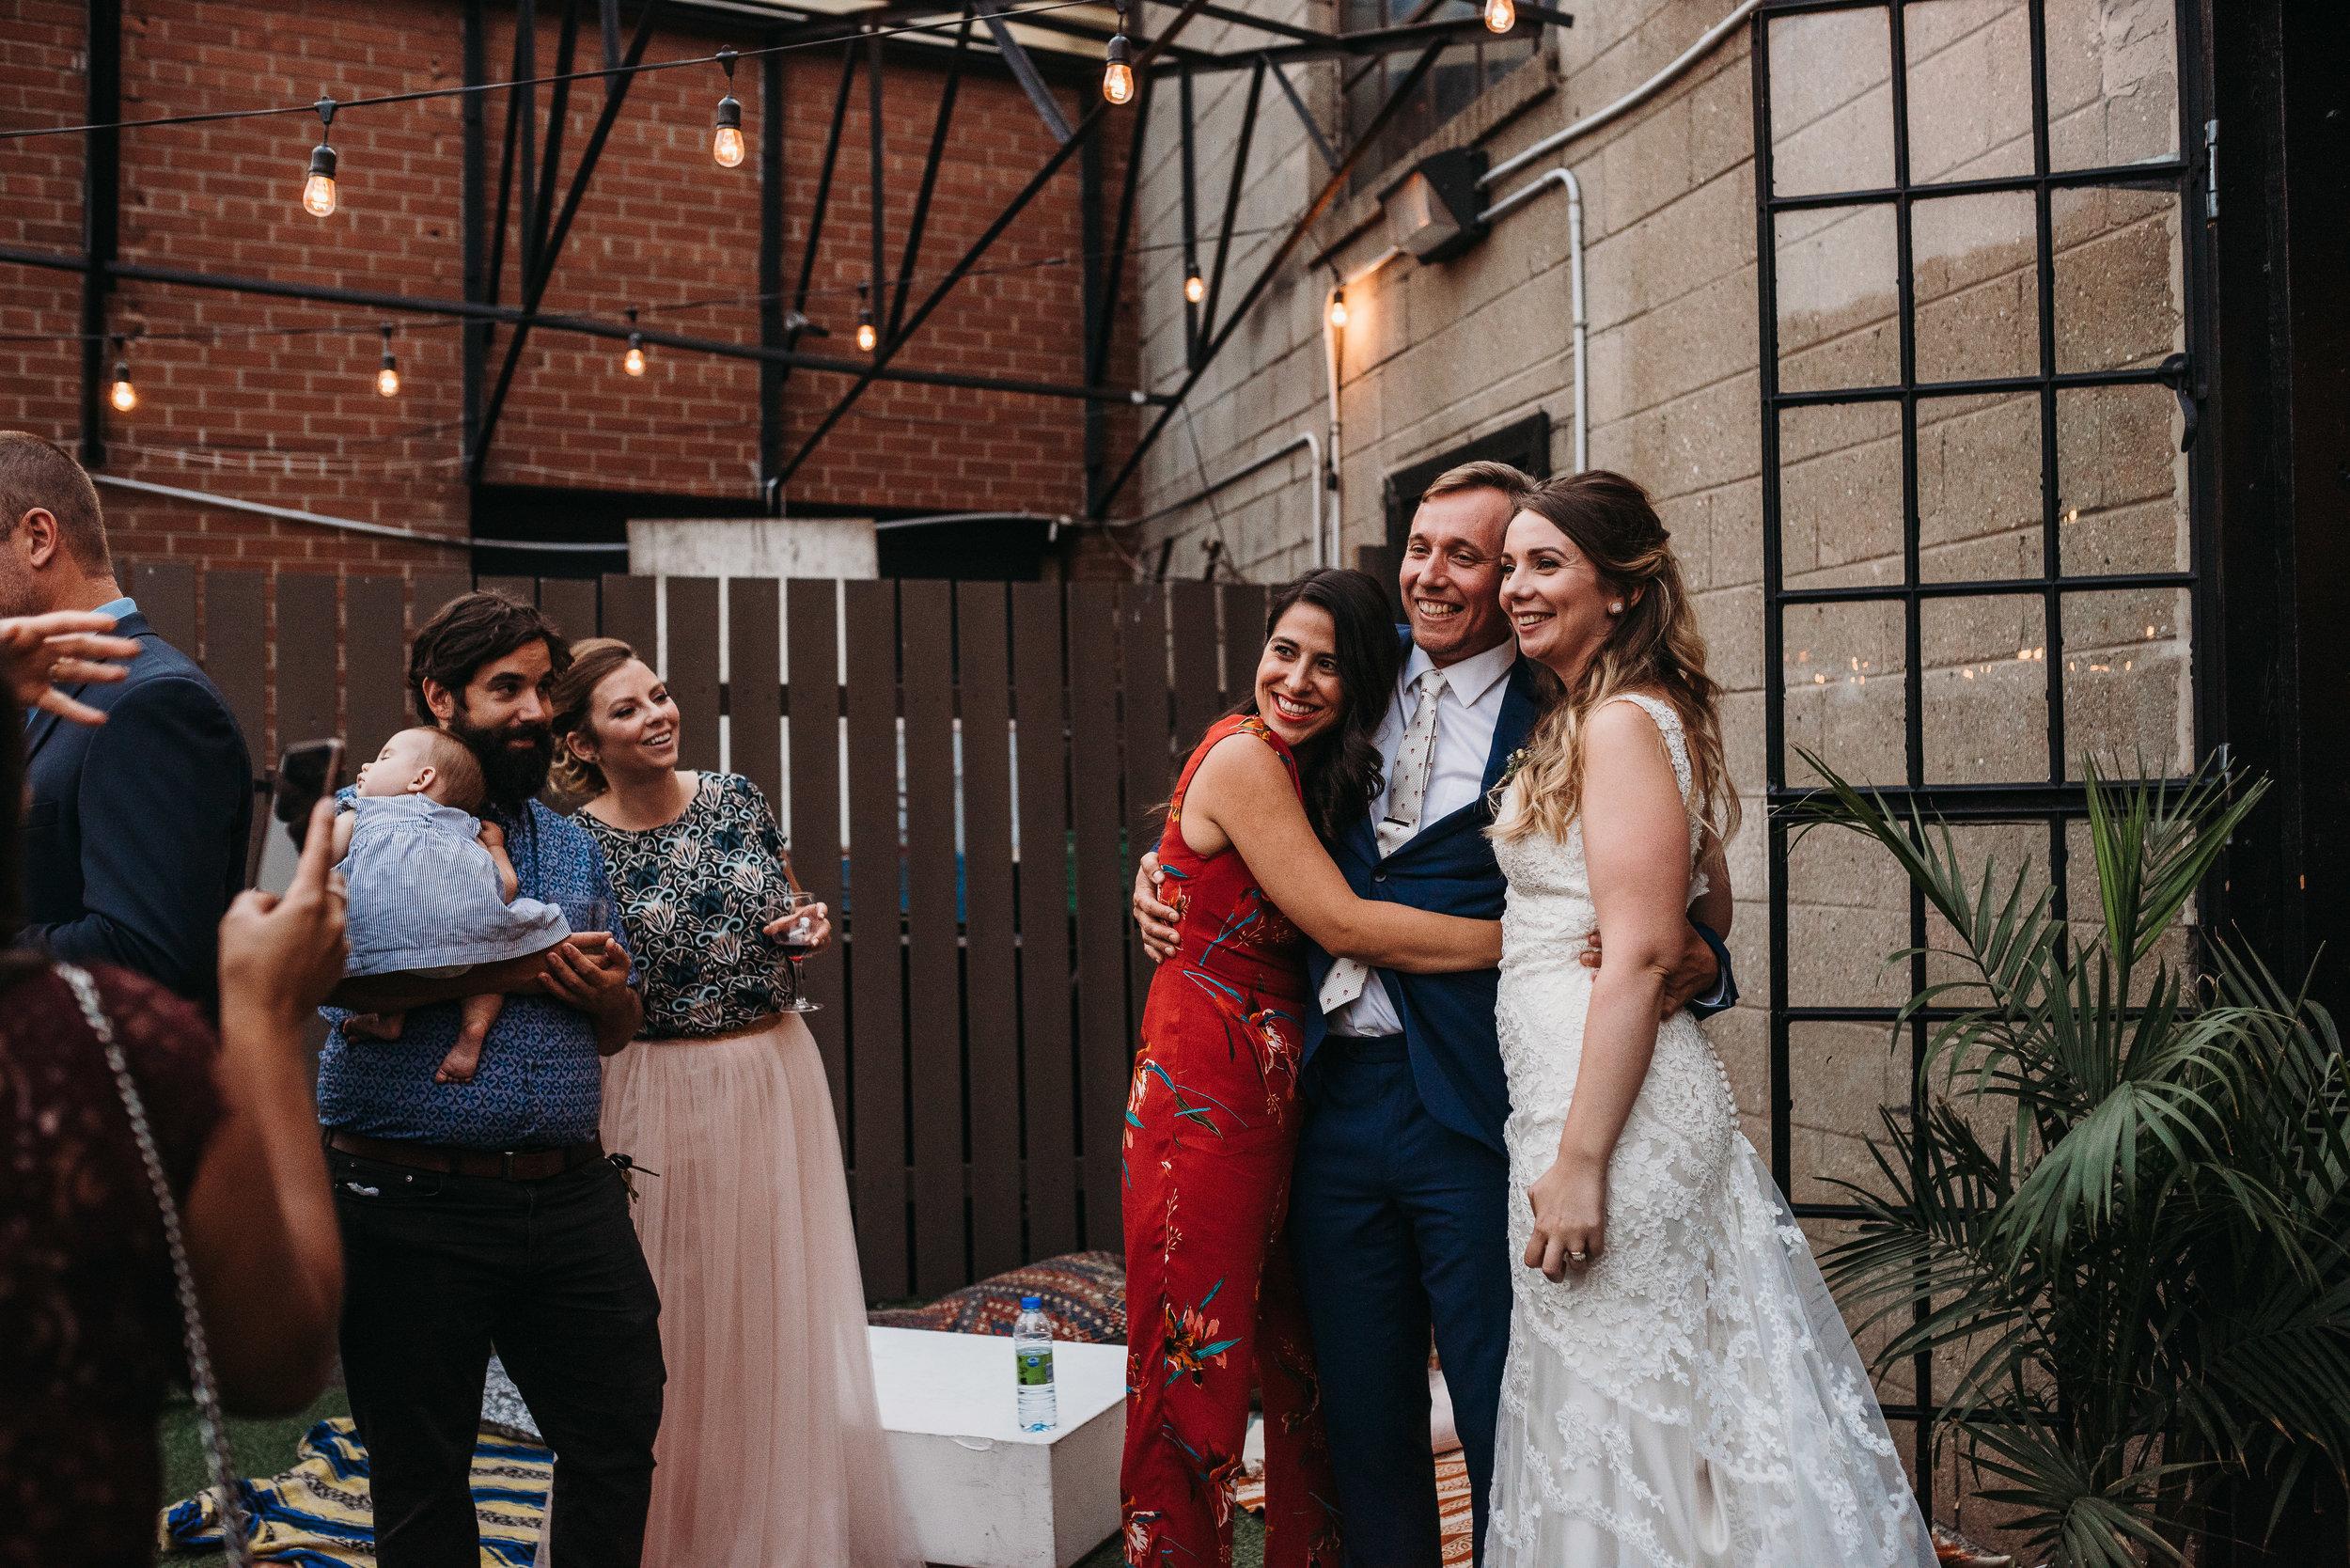 wedding-guest-pictures-bride-groom-toronto-rustic-boho-airship37-wedding-by-willow-birch-photo-toronto-documentary-wedding-photographers.jpg